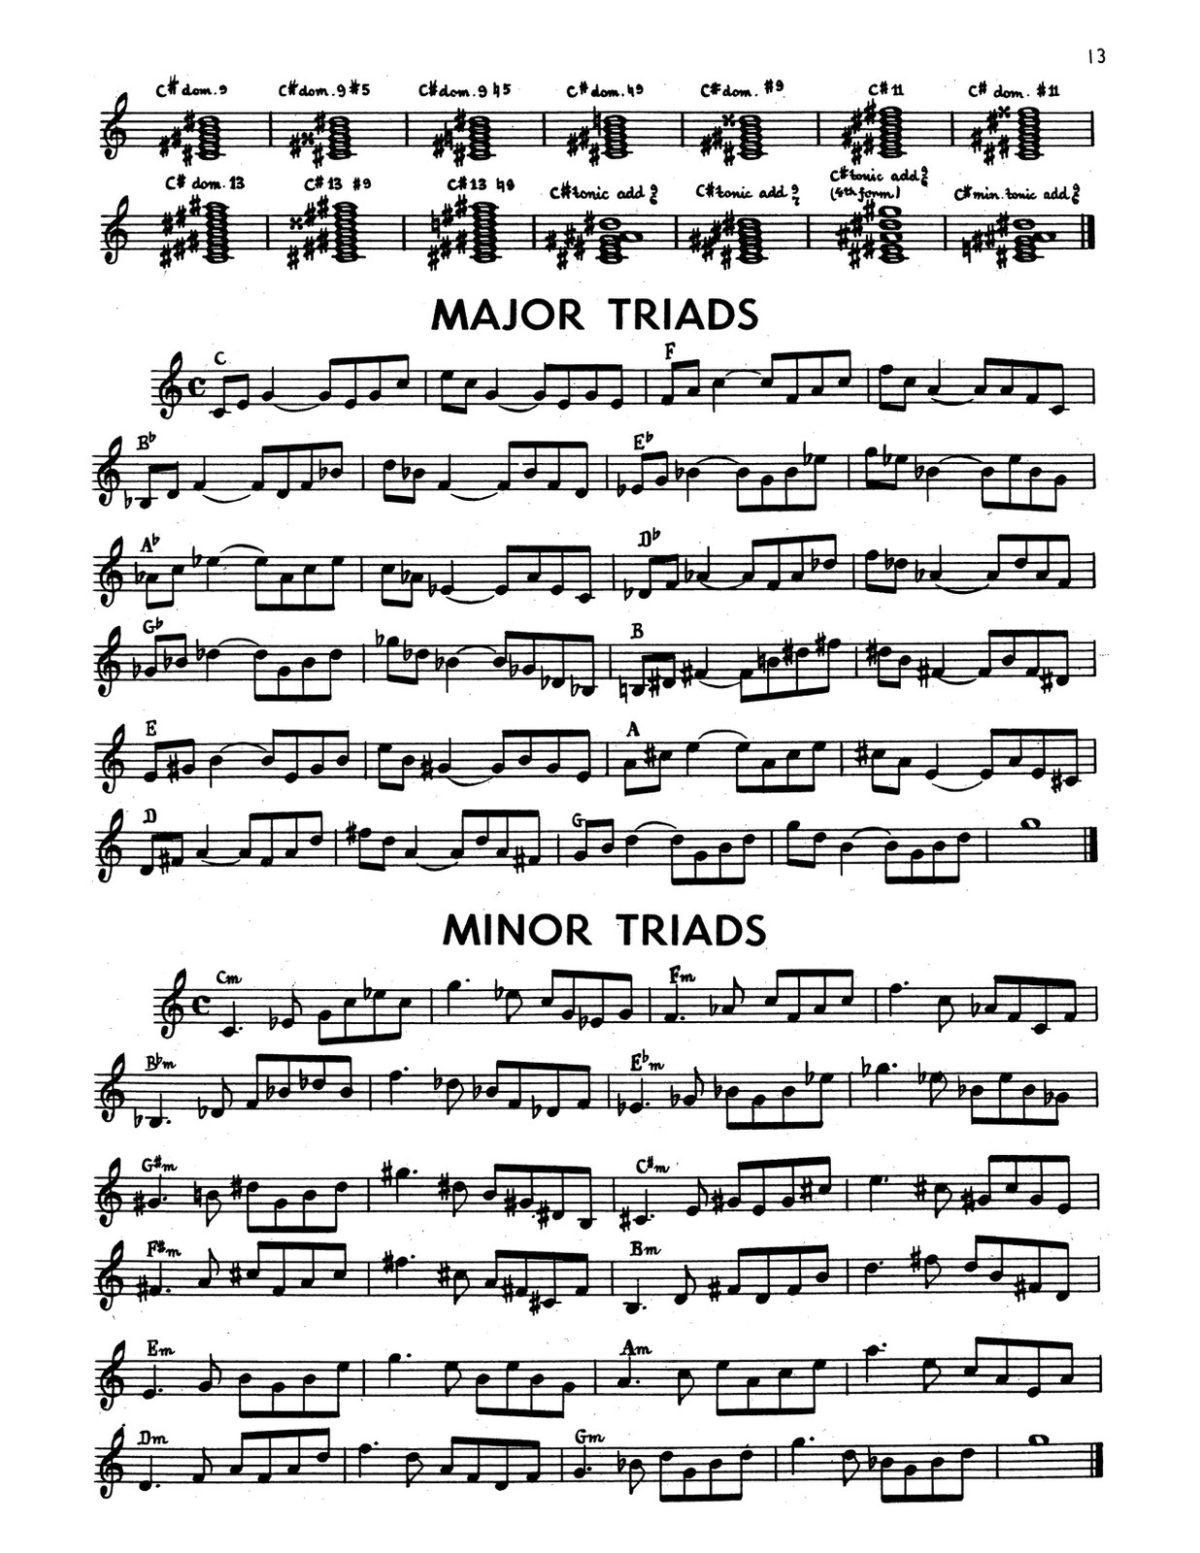 Gornston, All Chords for Trumpet-p15